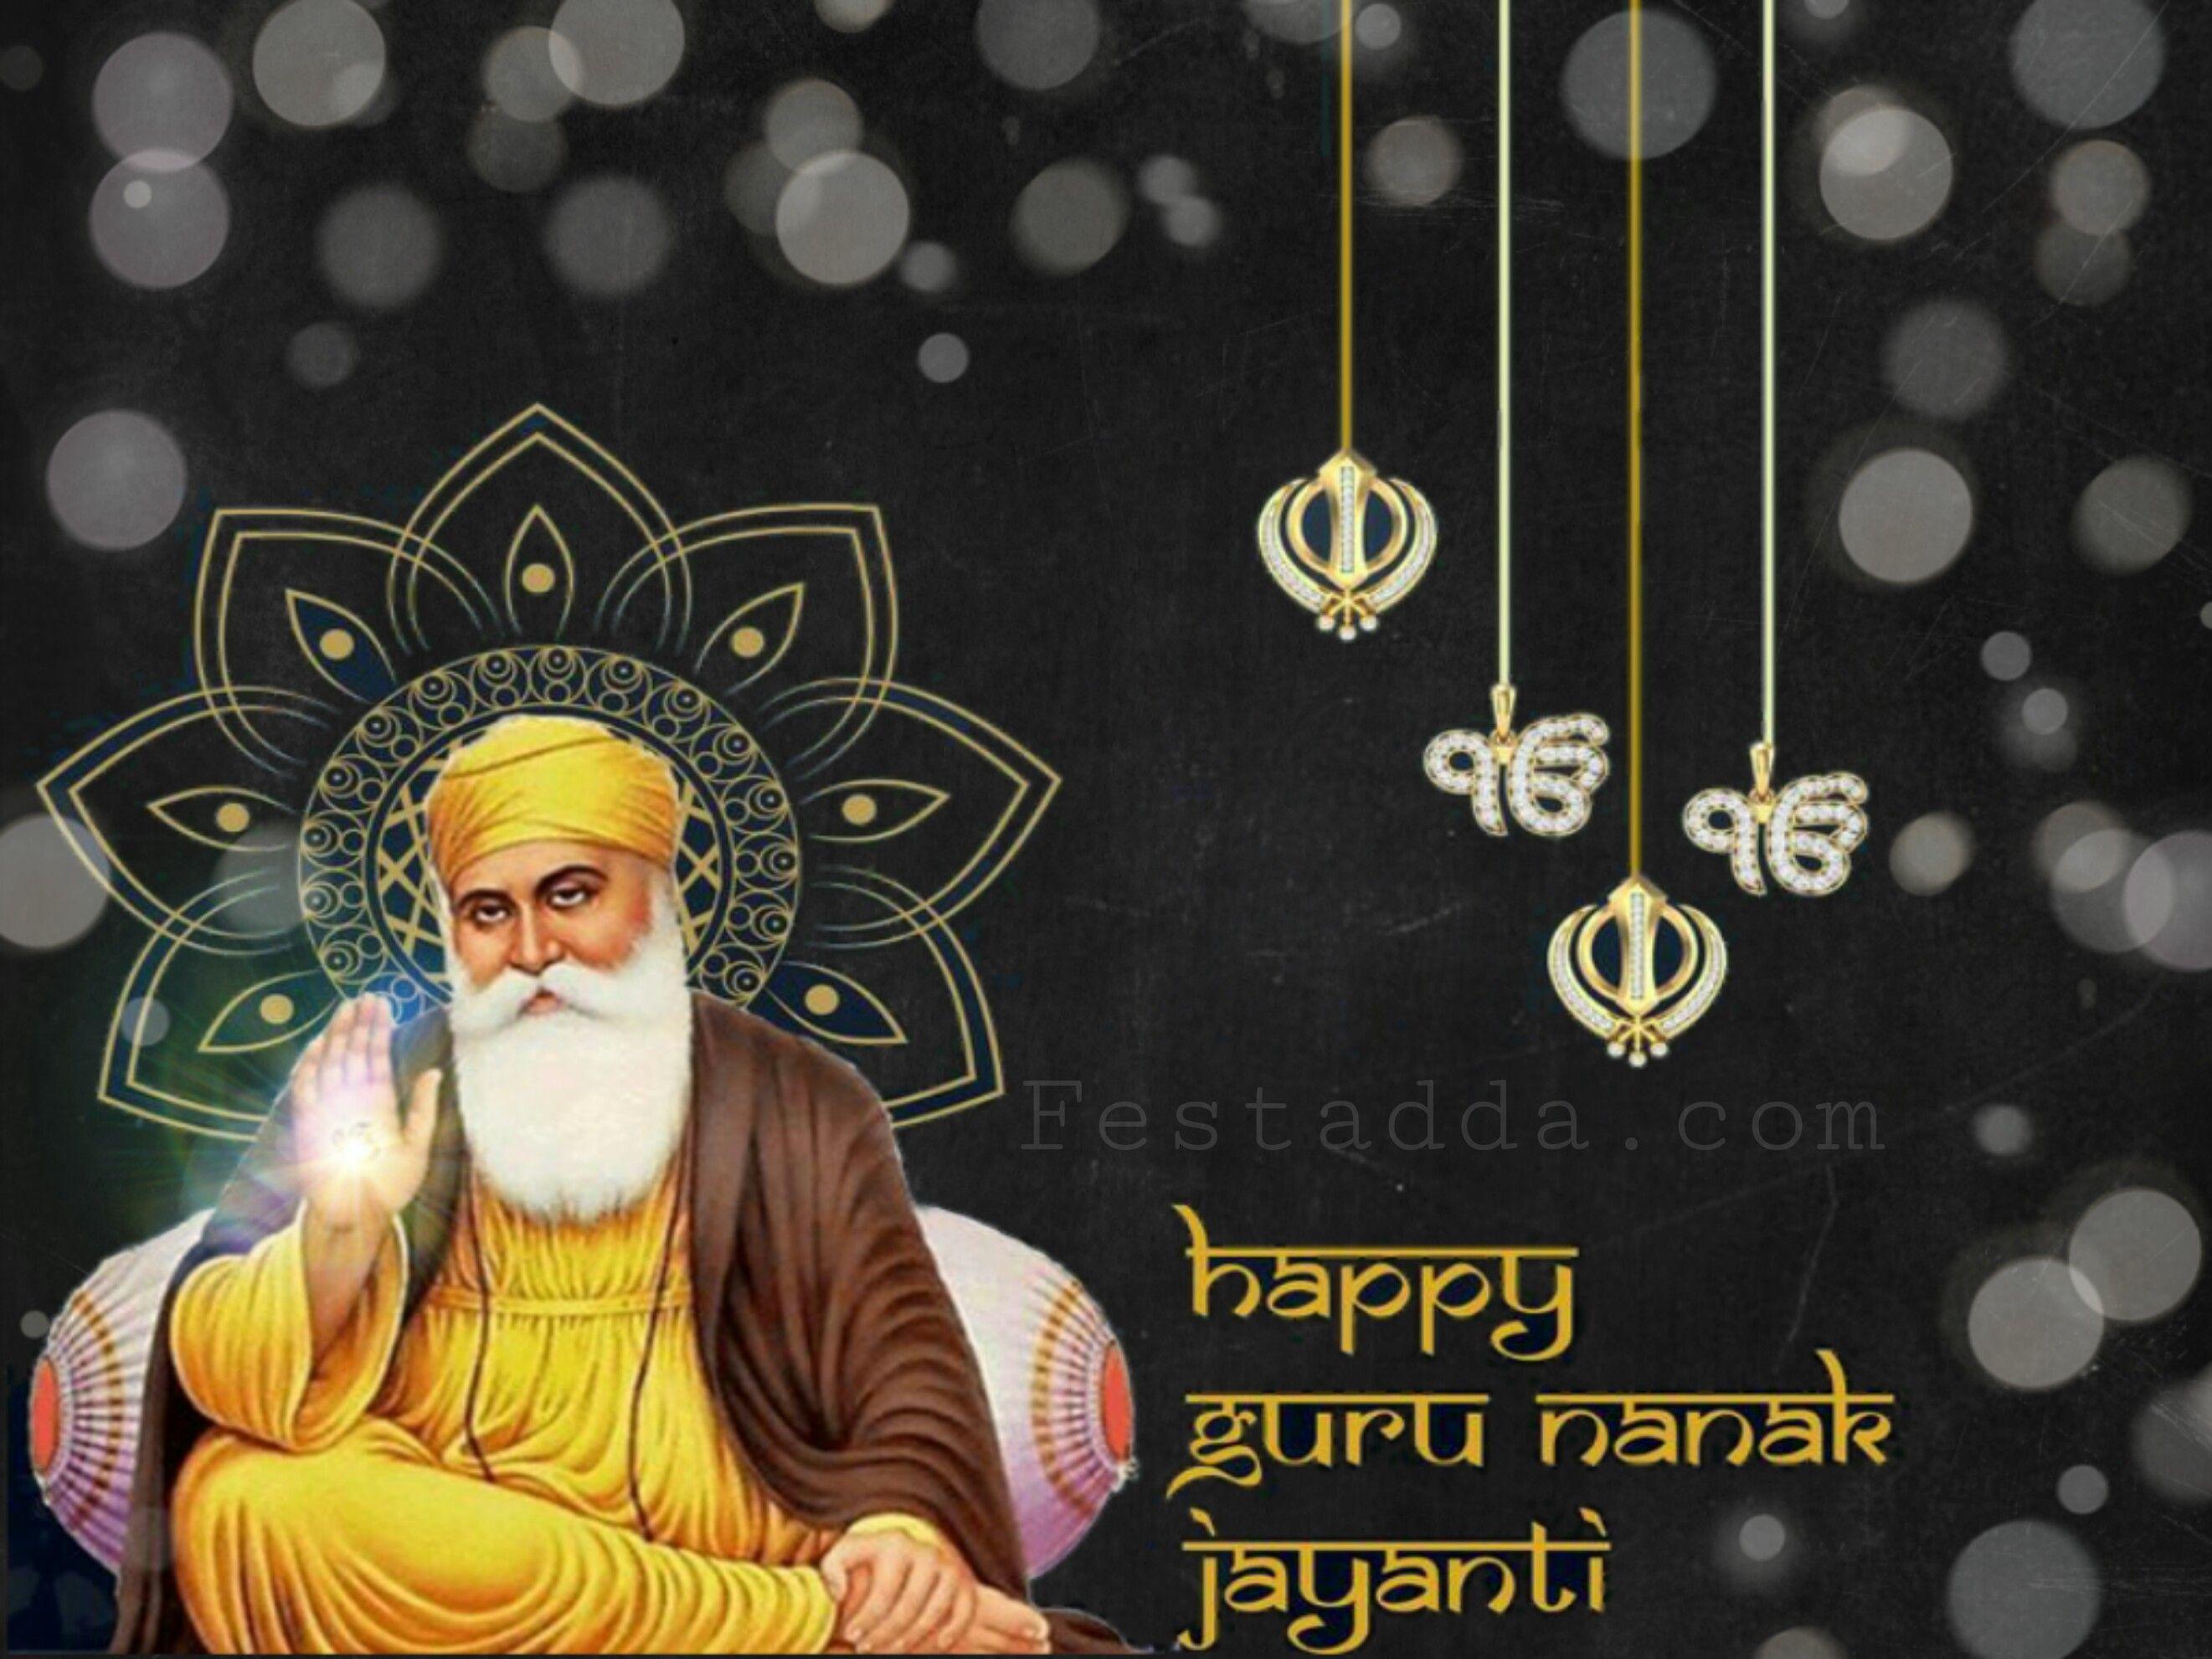 Happy Guru Nanak Jayanti Wishes 2020 Greetings Images HD